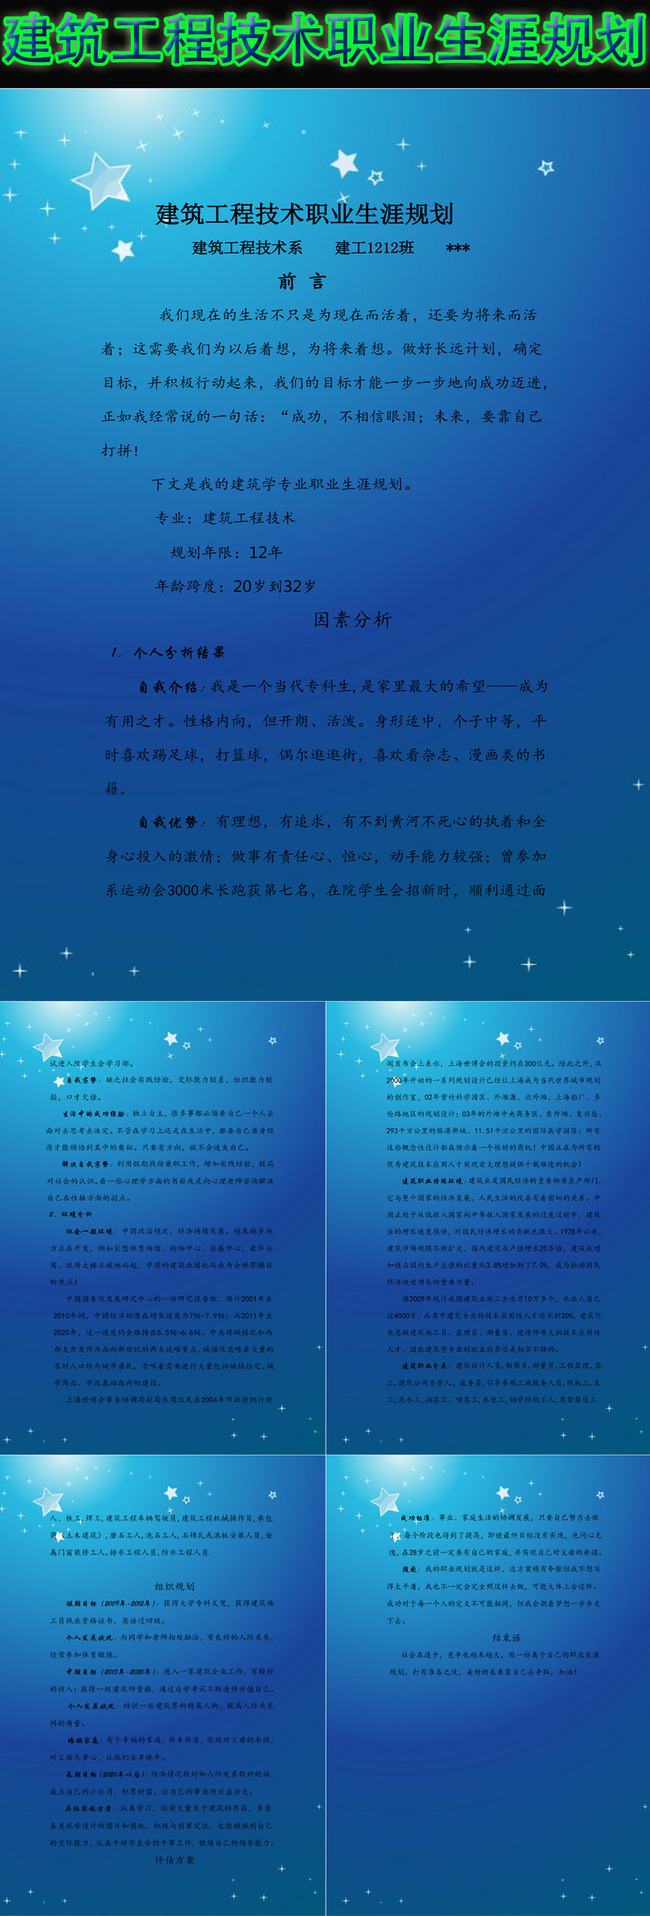 word模板 应用文书 > 建筑工程技术职业生涯规划